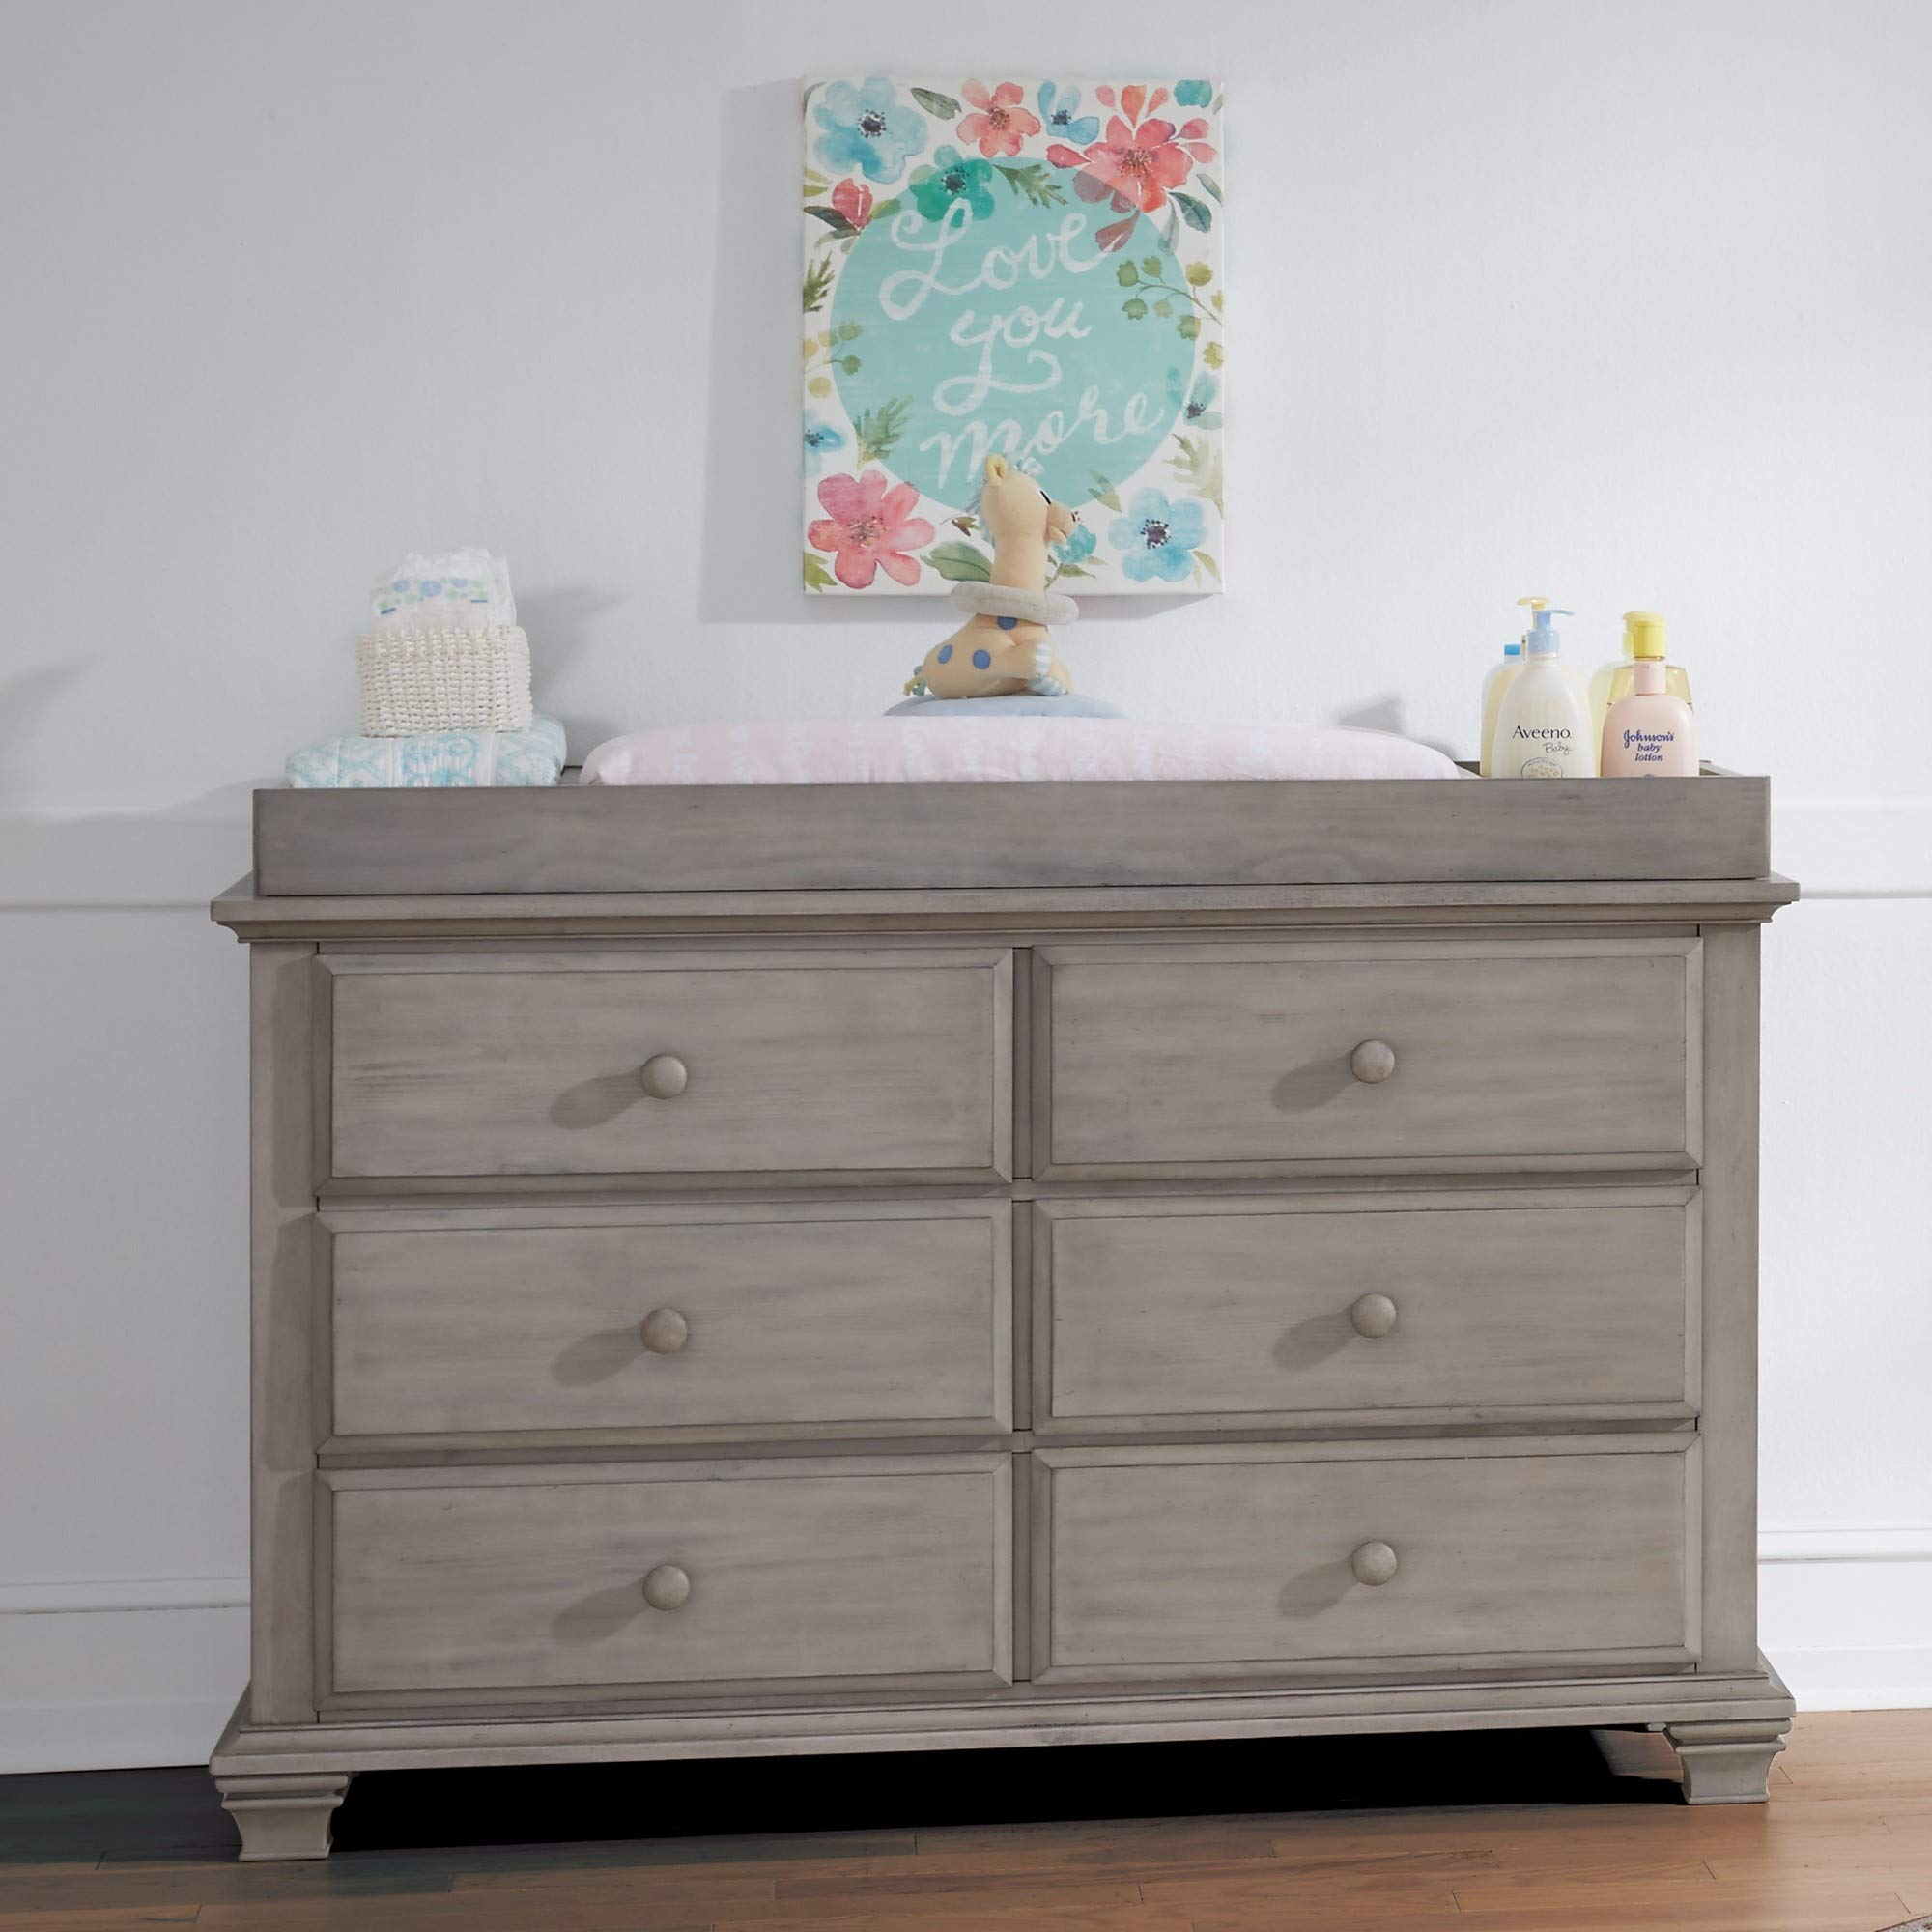 Oxford Baby Kenilworth 6 Drawer Dresser, Stone Wash by Oxford Baby